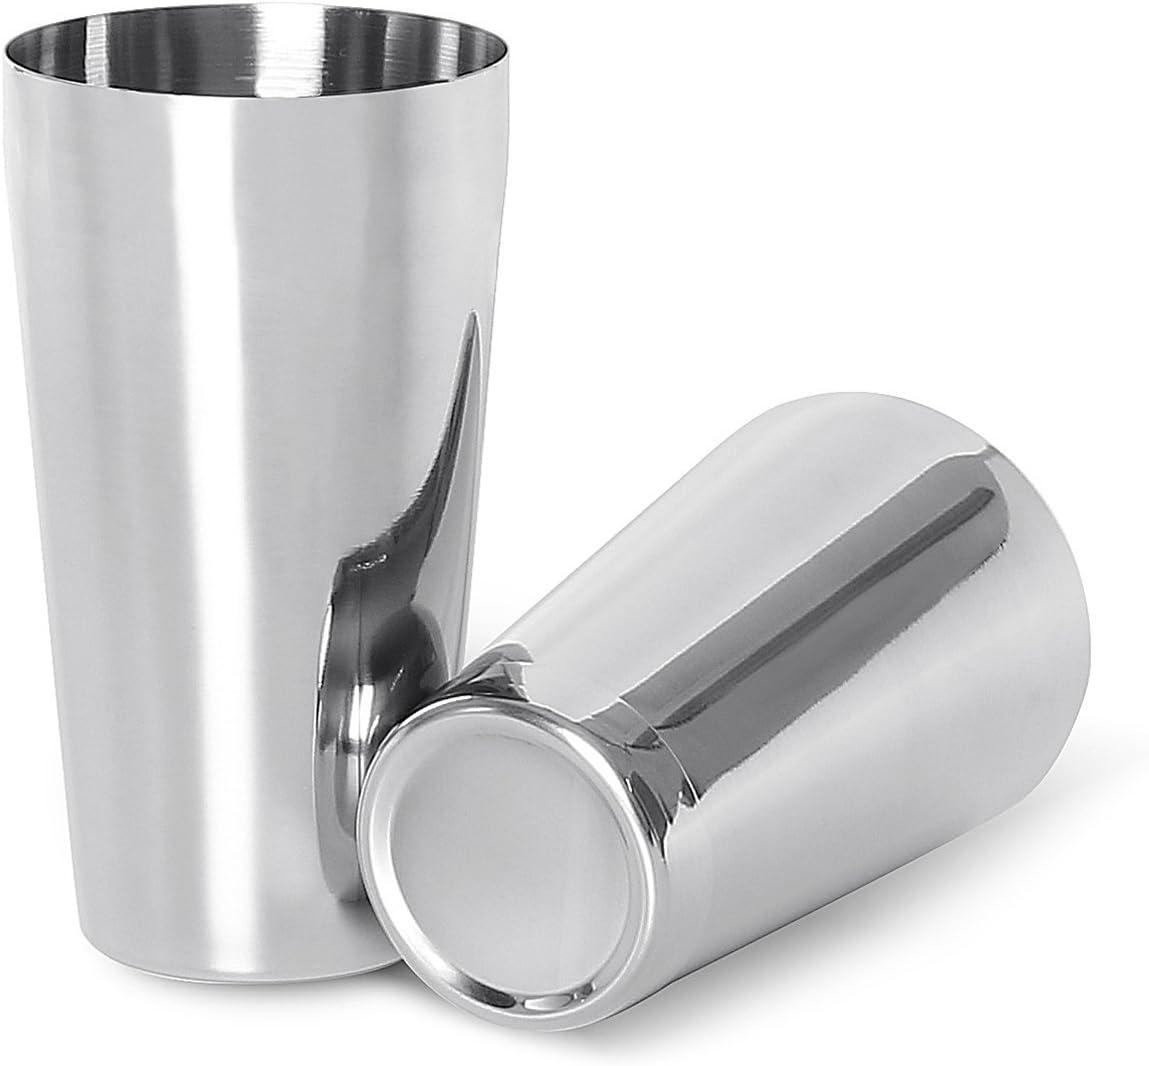 Conjunto de Coctelería Boston de LANZON, Cocteleras Boston 2 Piezas, 500ml(18oz) & 750ml(26oz) Shaker Tins